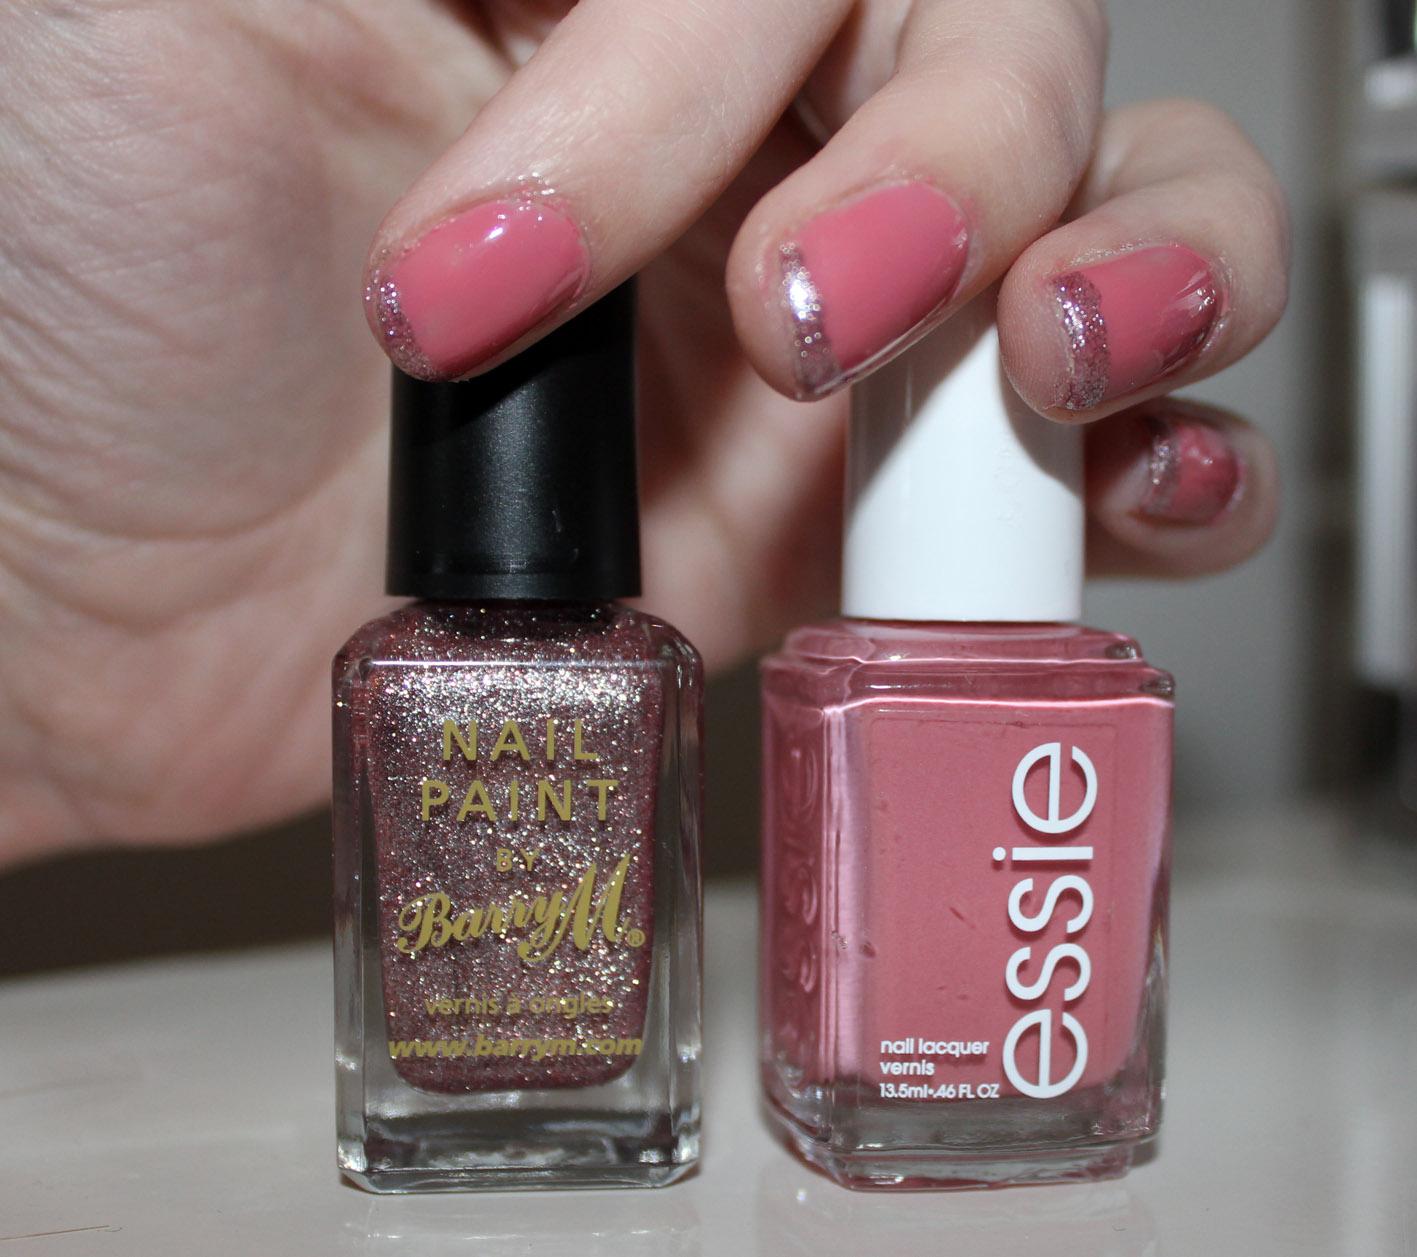 Best Essie Glitter Nail Polish - To Bend Light